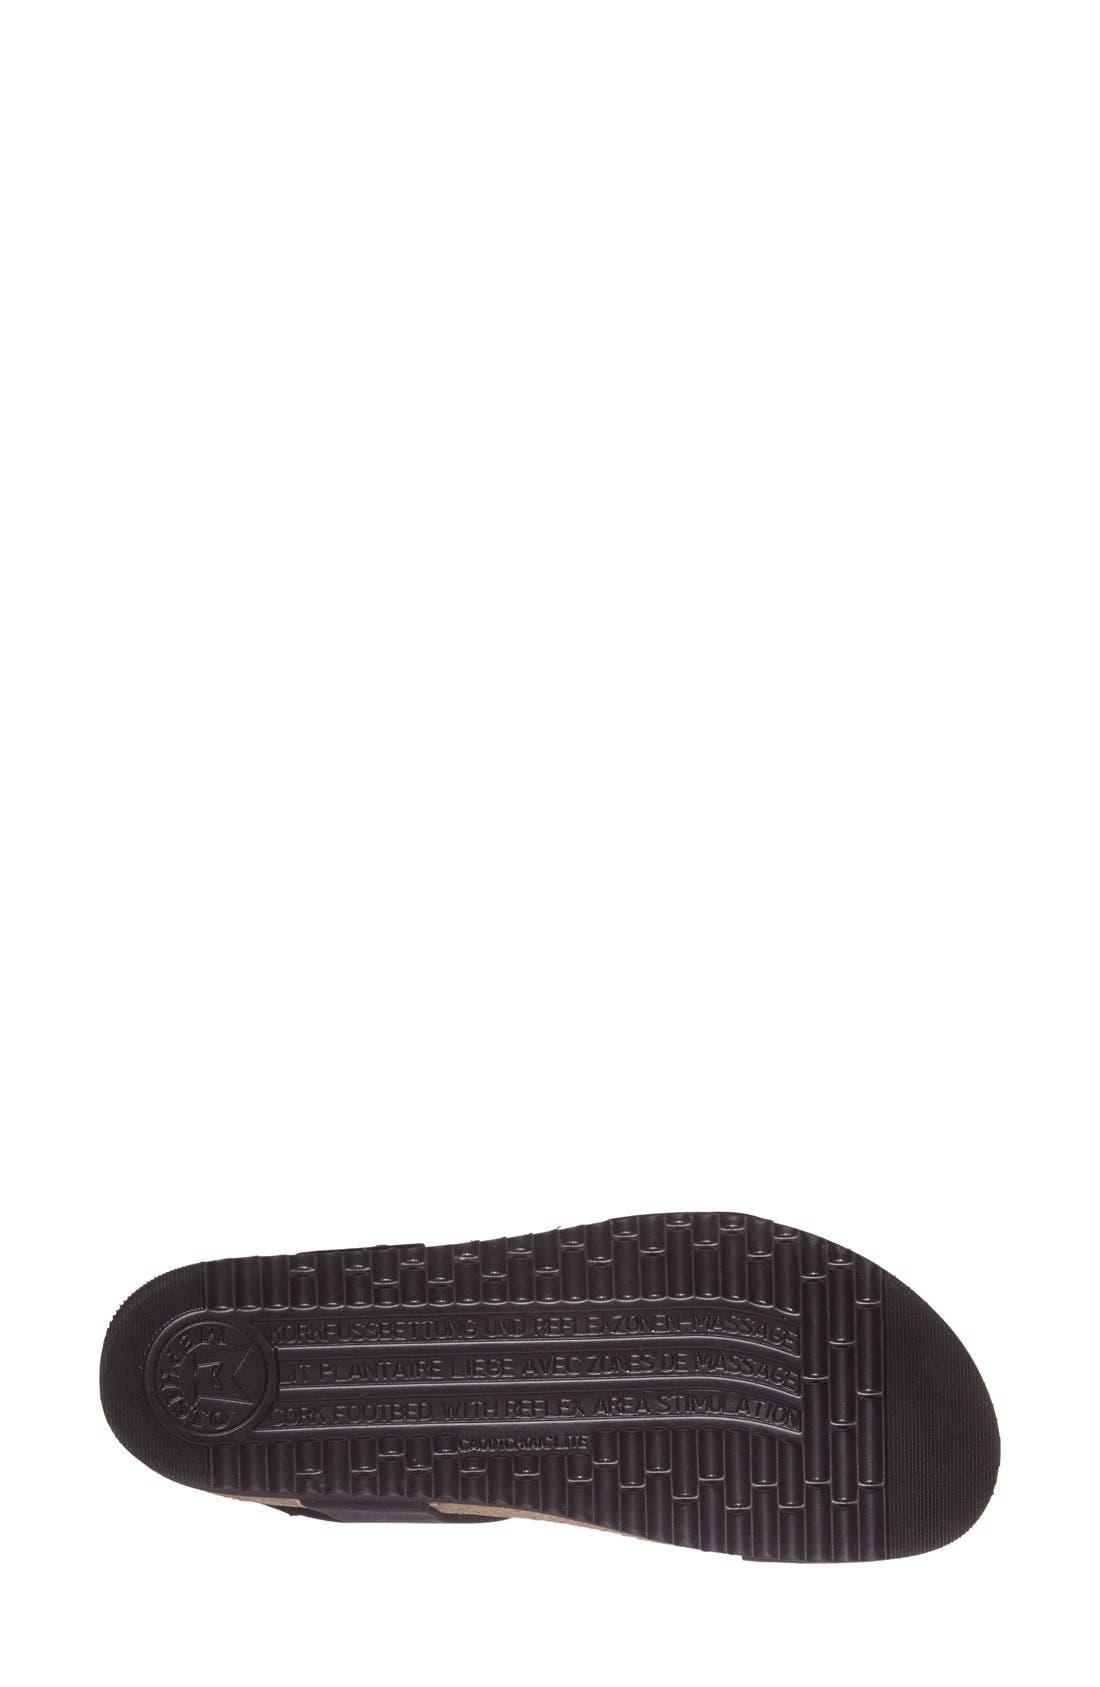 Alternate Image 4  - Mephisto 'Honoria' Nubuck Leather Sandal (Women)